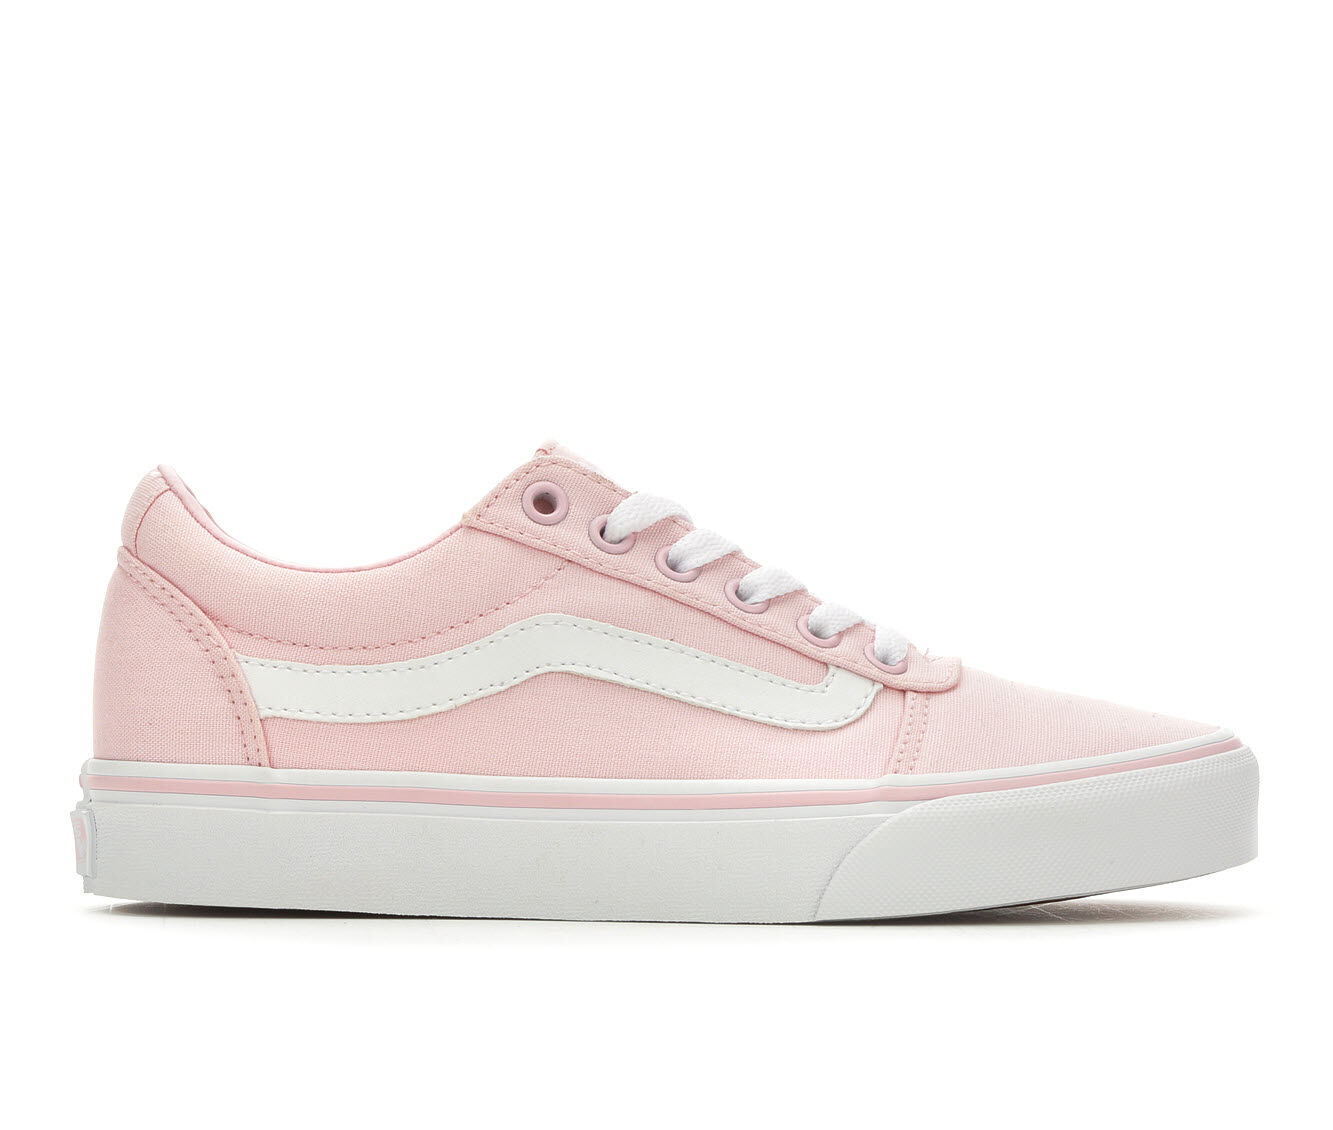 Women's Vans Ward Skate Shoes Chalk Pink/Wht